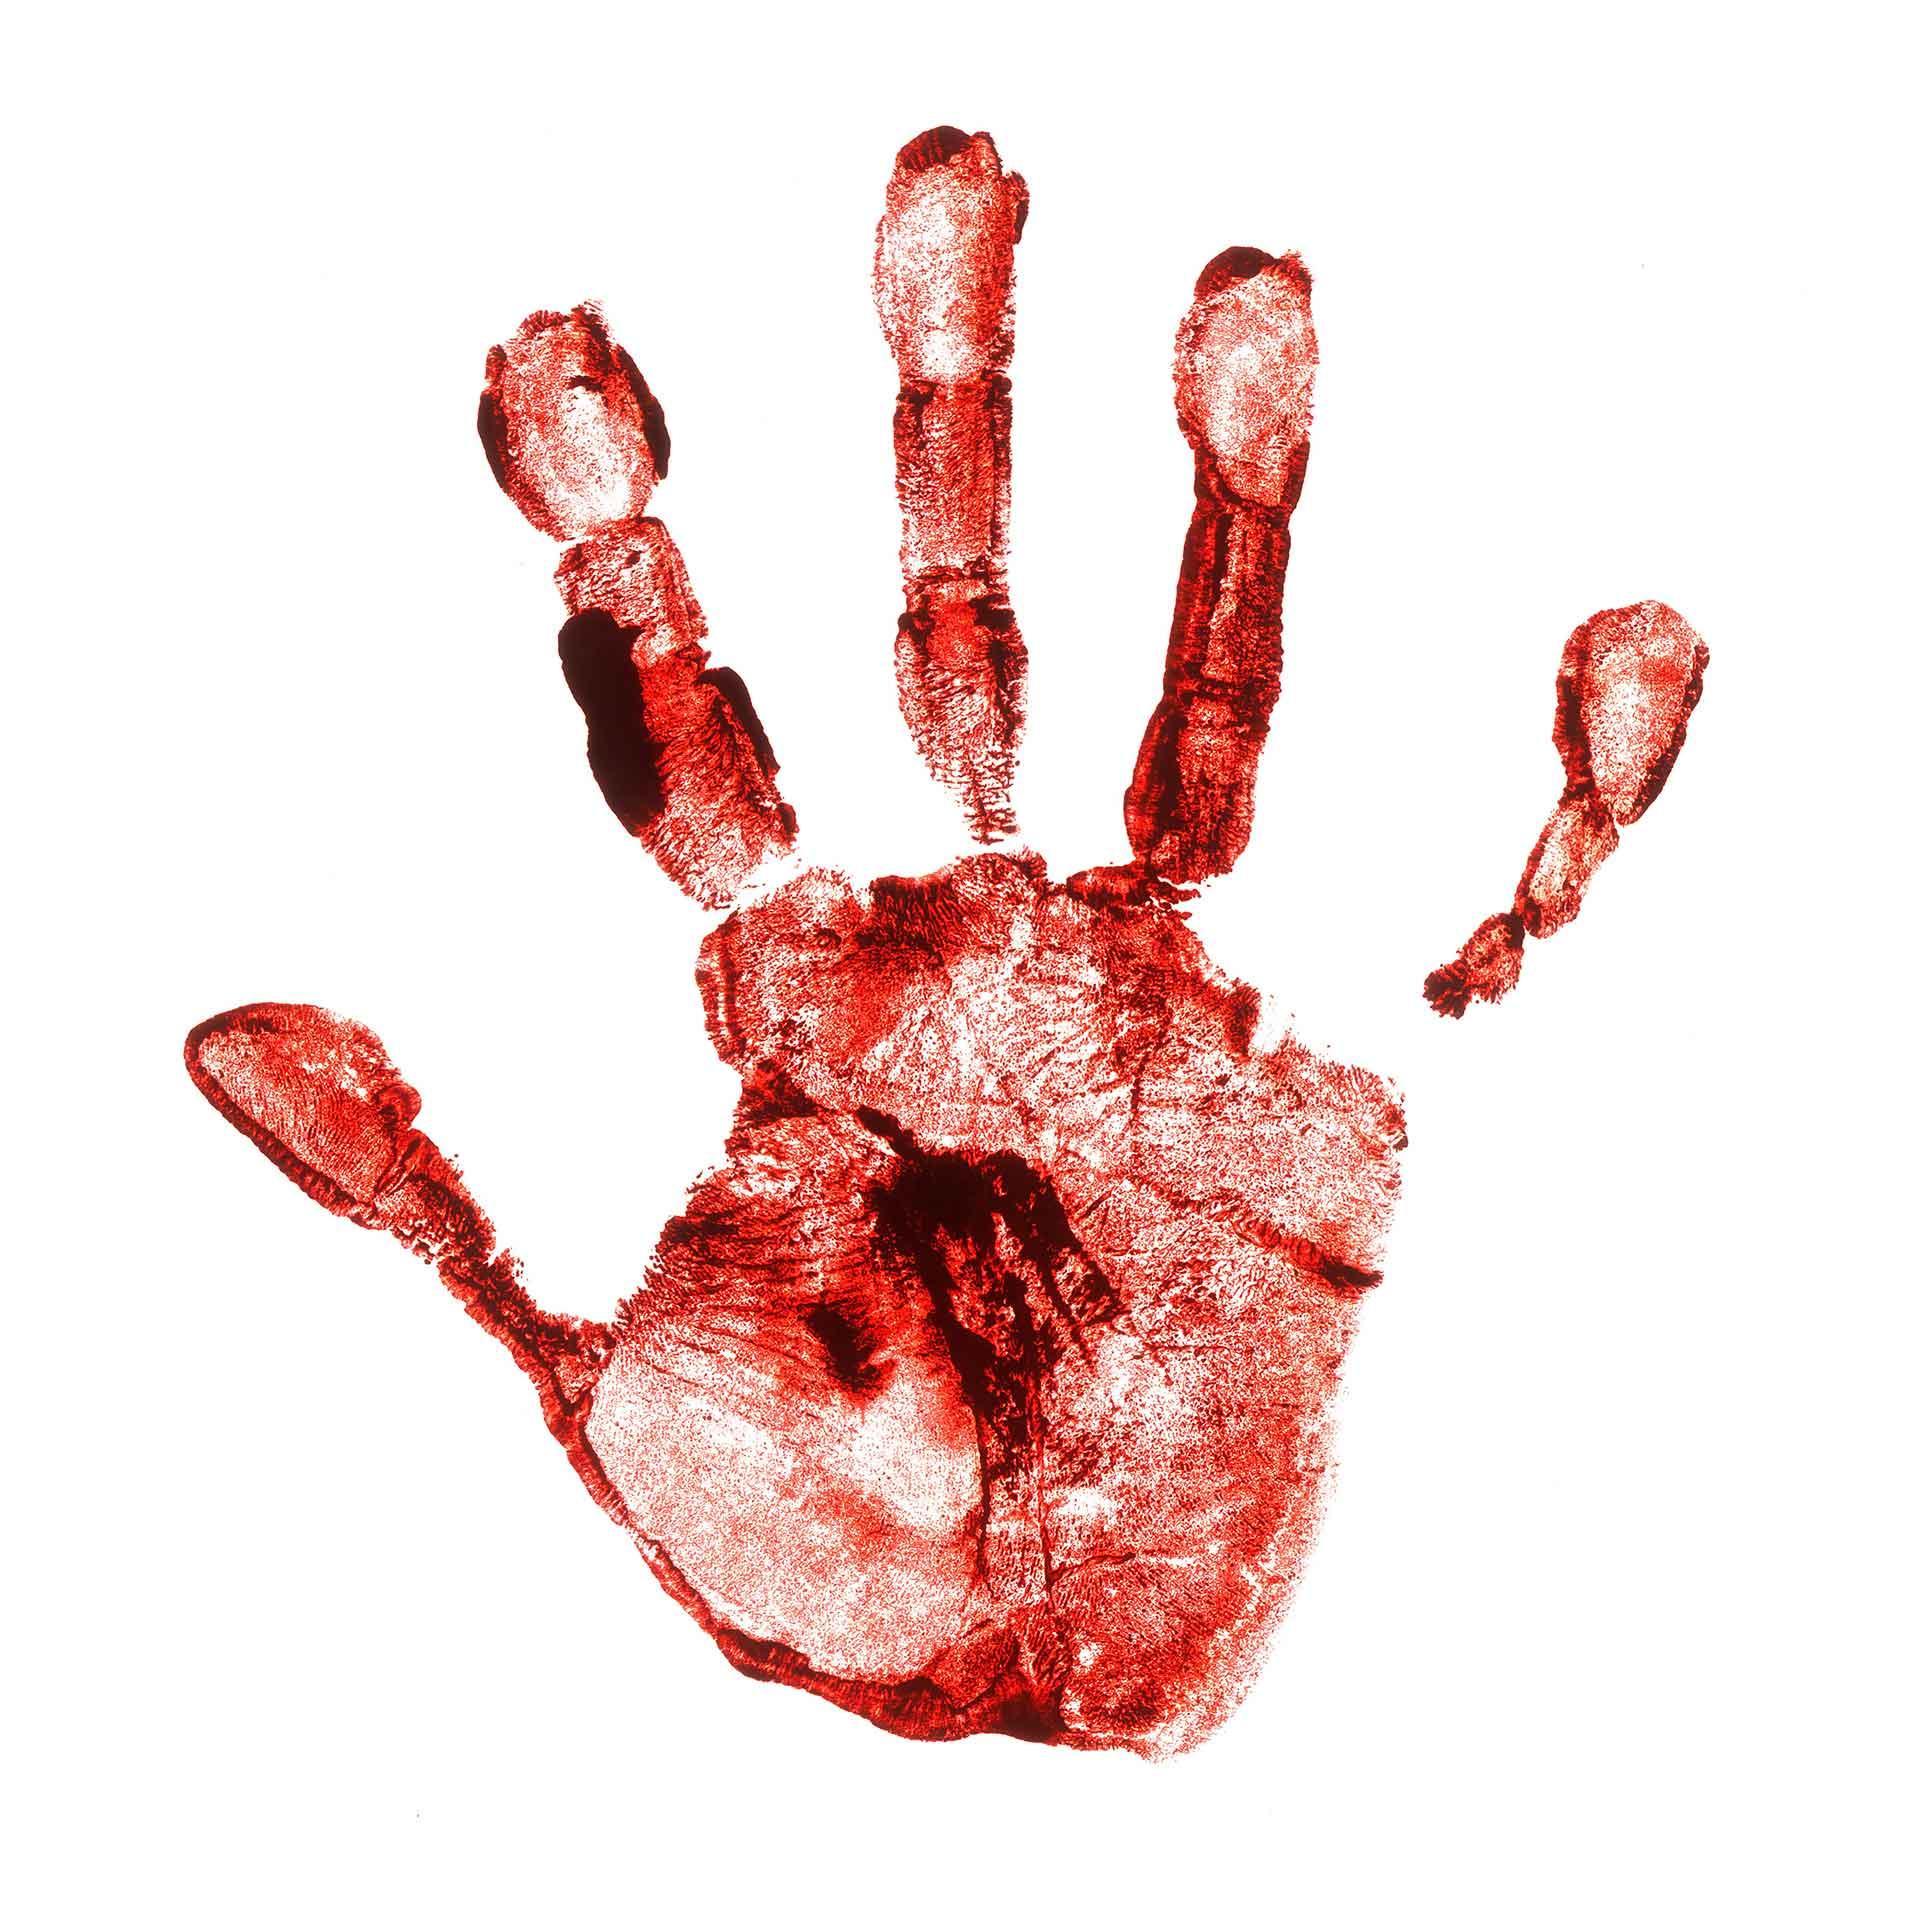 Spraakmakende strafzaken - Dood Landgraafse baby